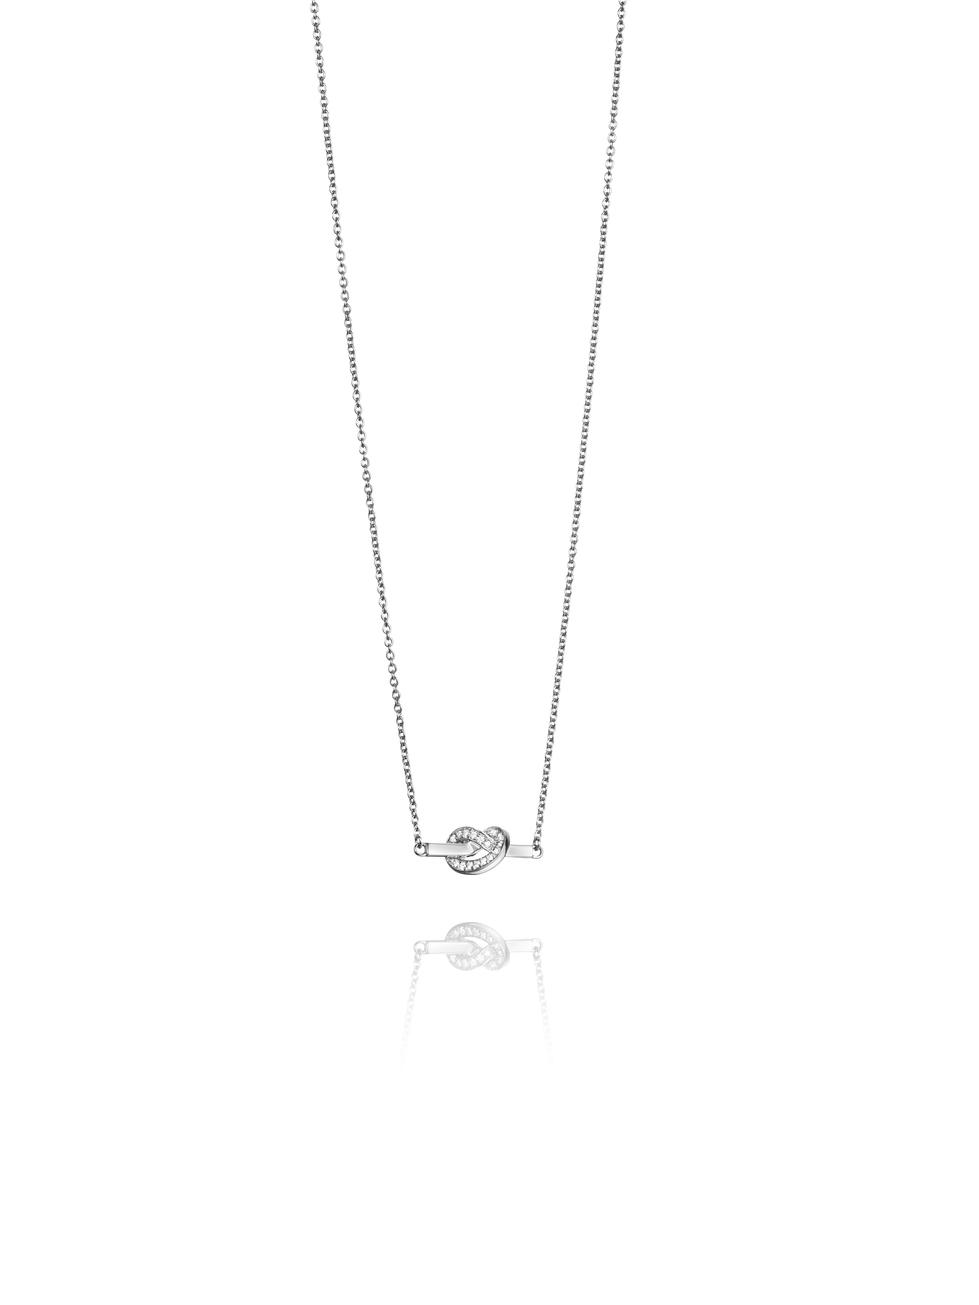 Love Knot & Stars Necklace 10-102-01303(2)